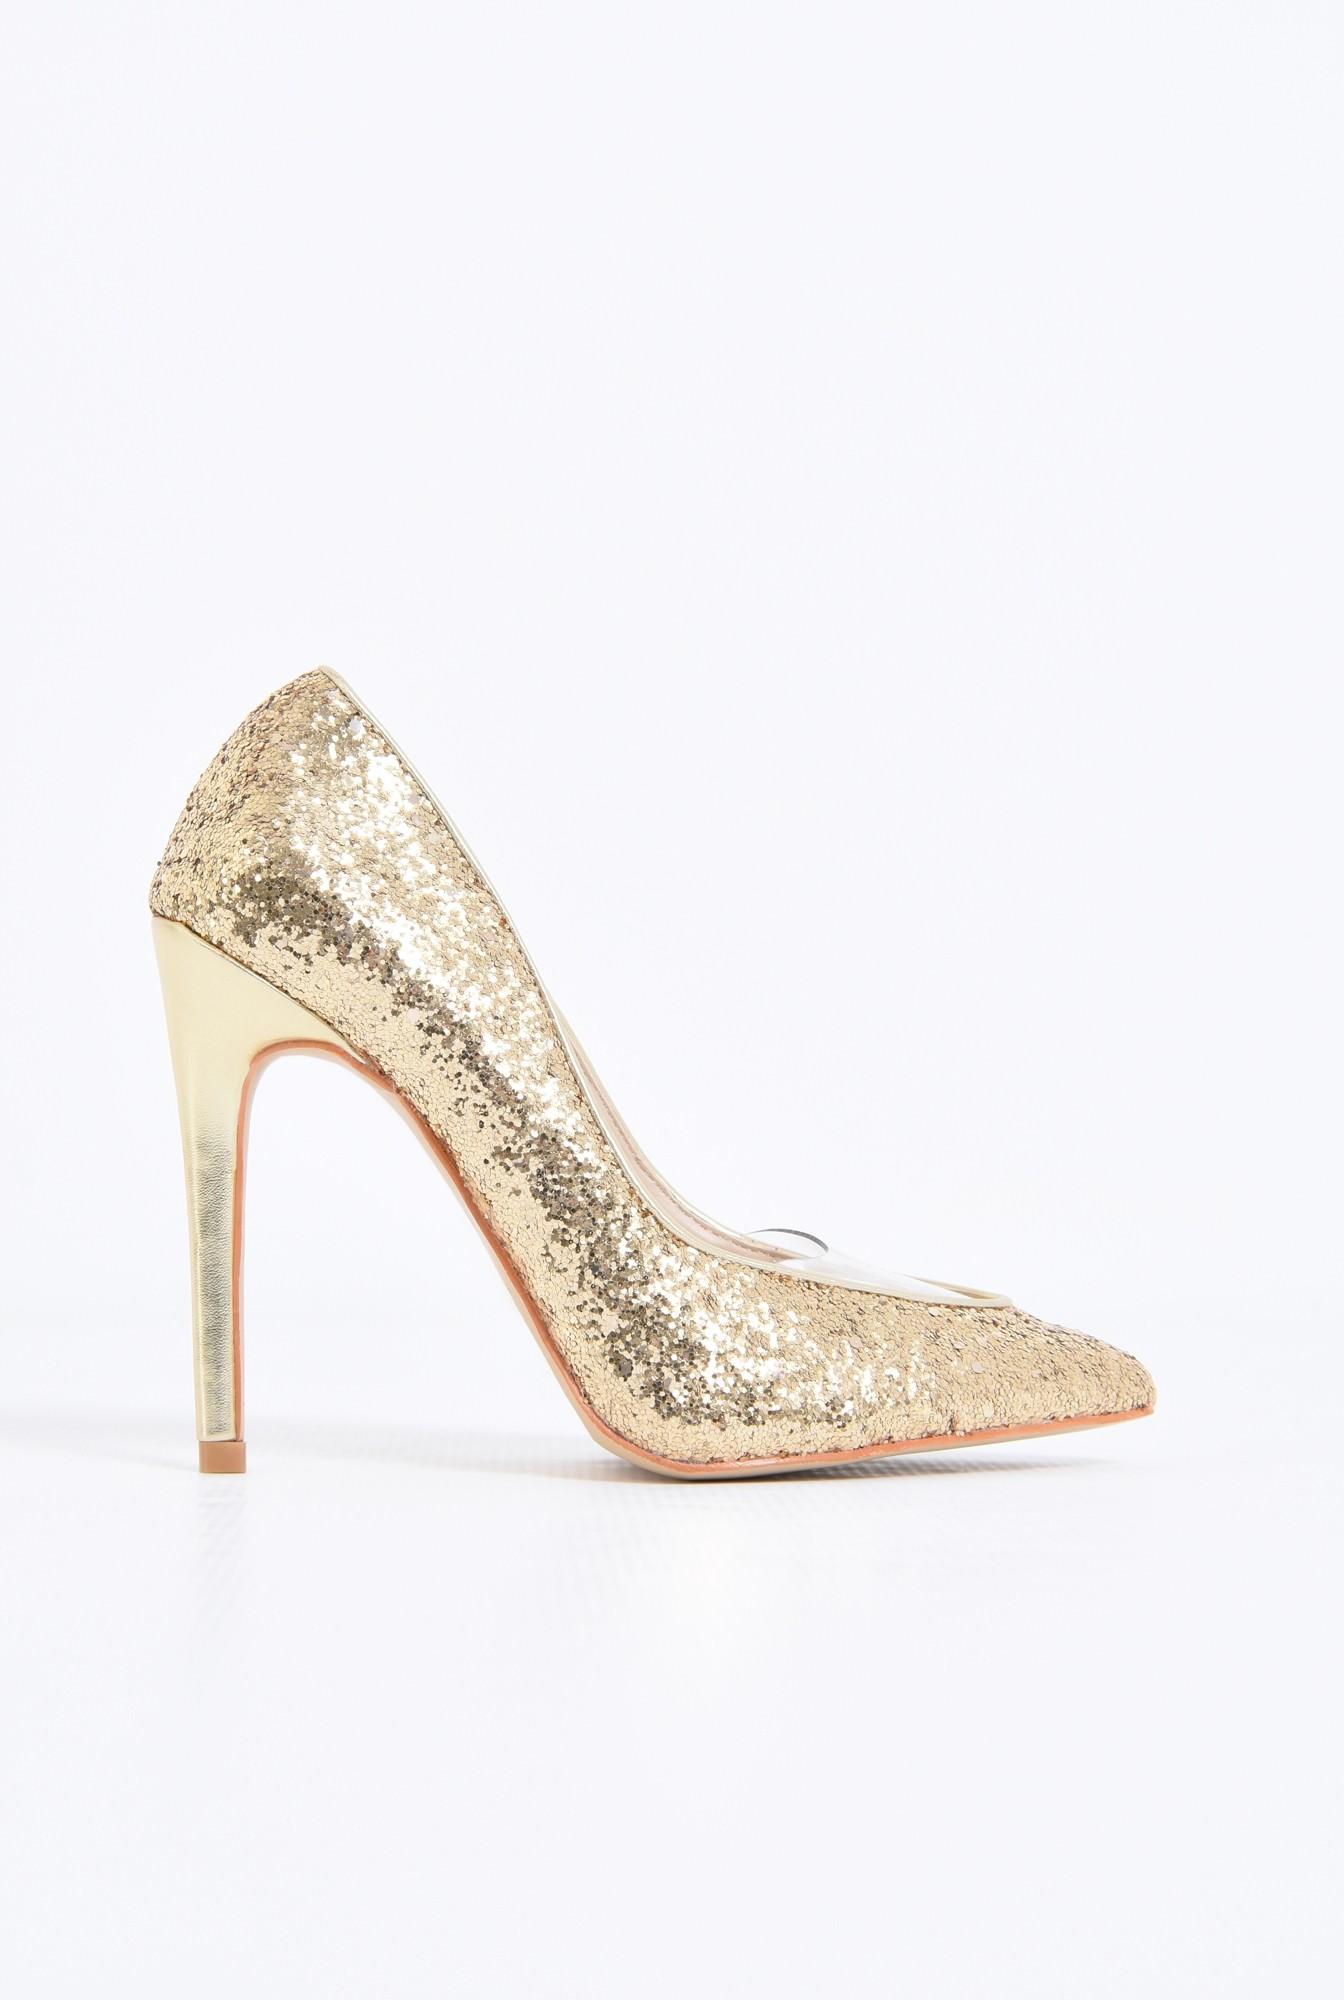 0 - pantofi eleganti, auriu, stiletto, glitter